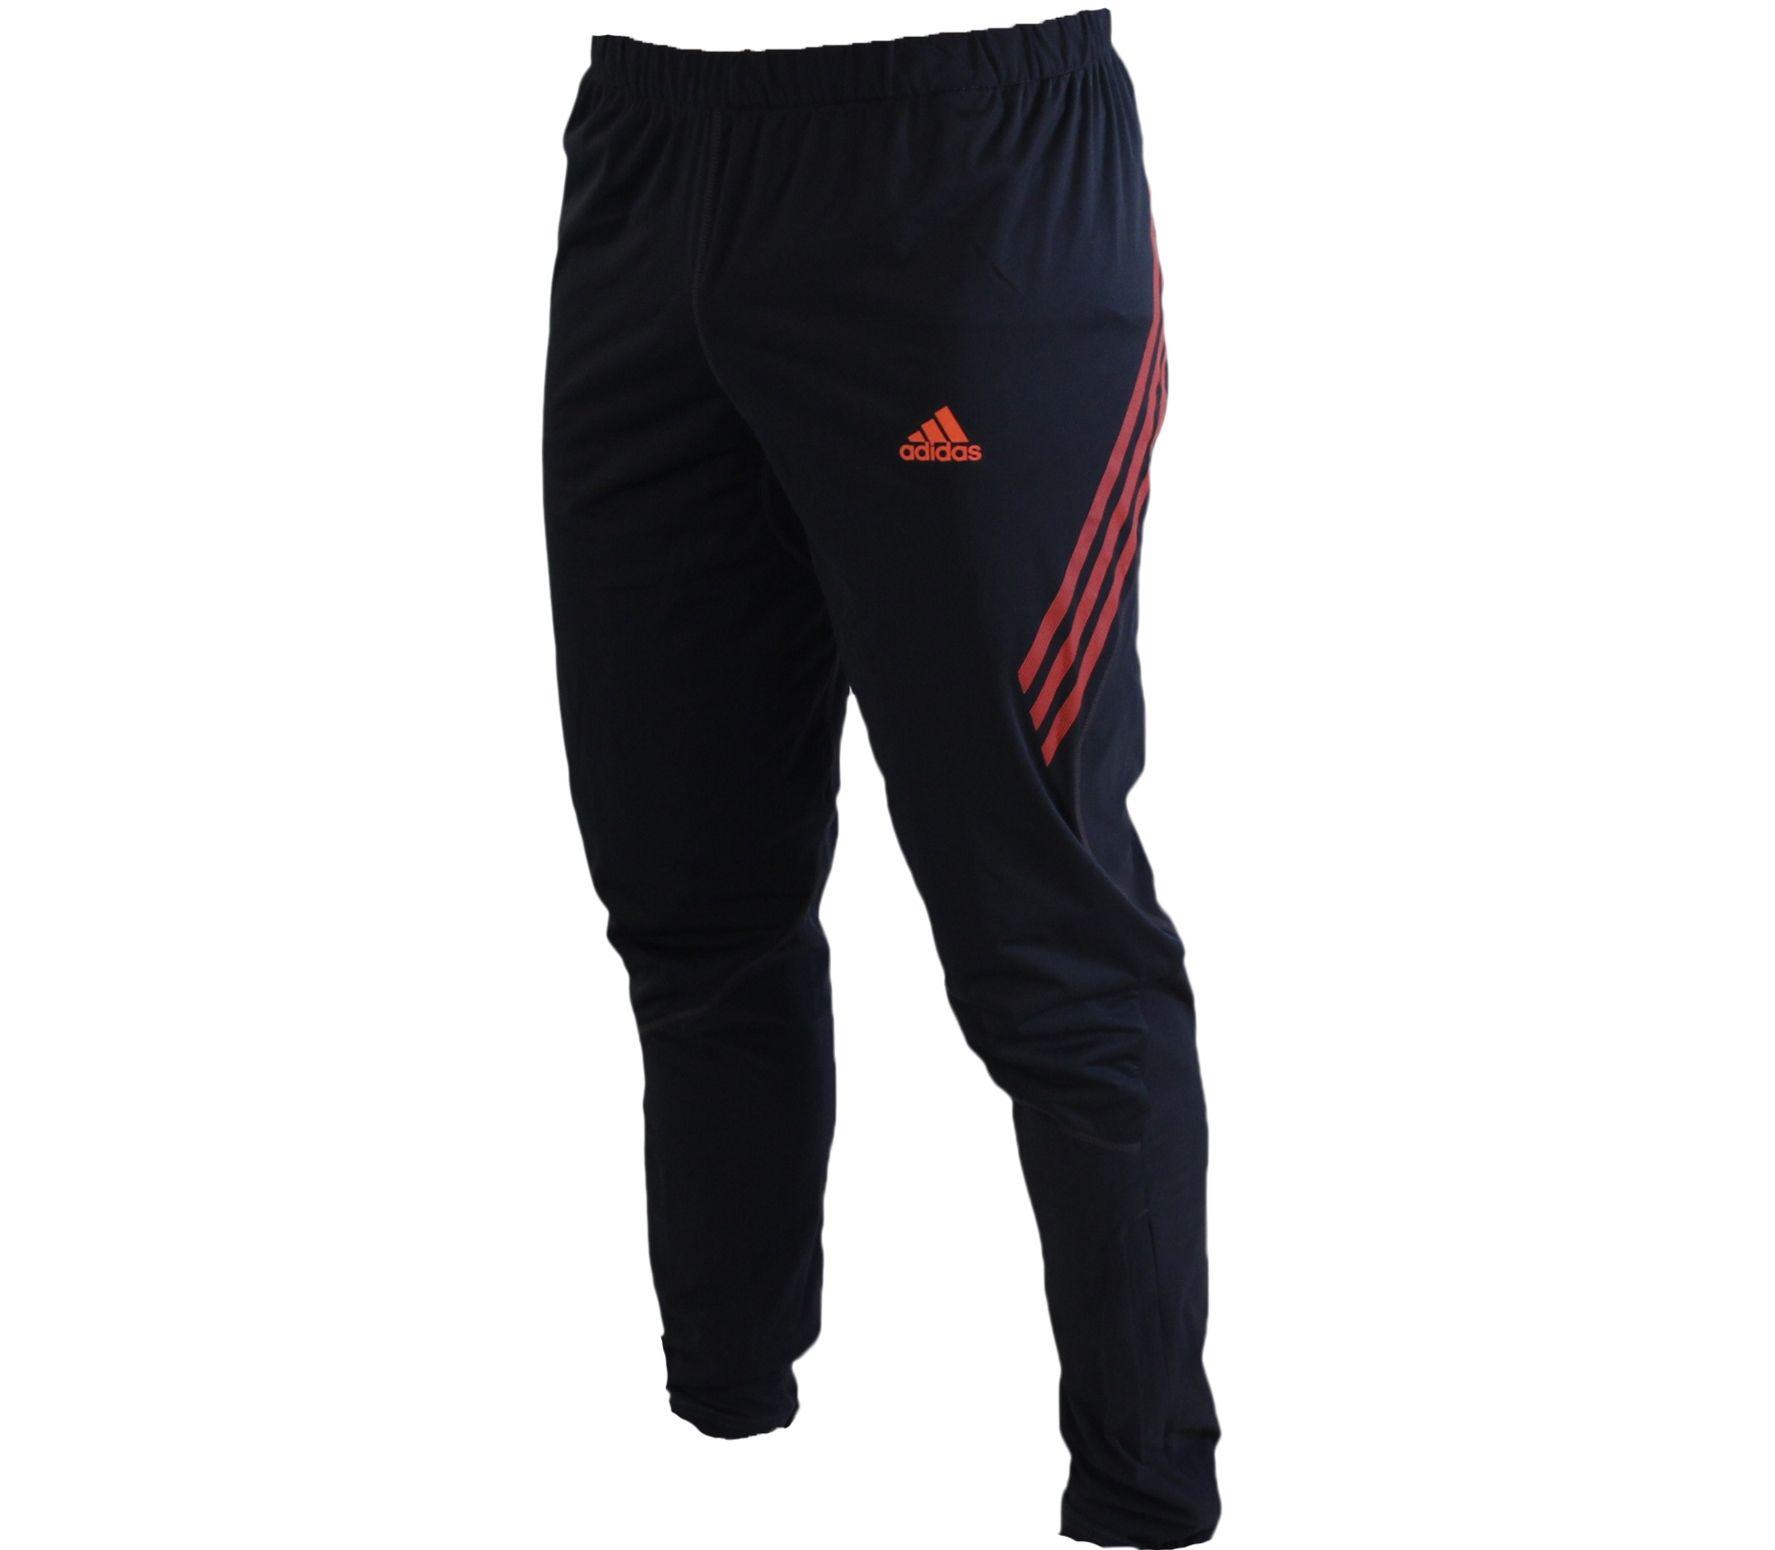 Adidas - Running Pants Adizero Wind Proof Pant gray/red ...